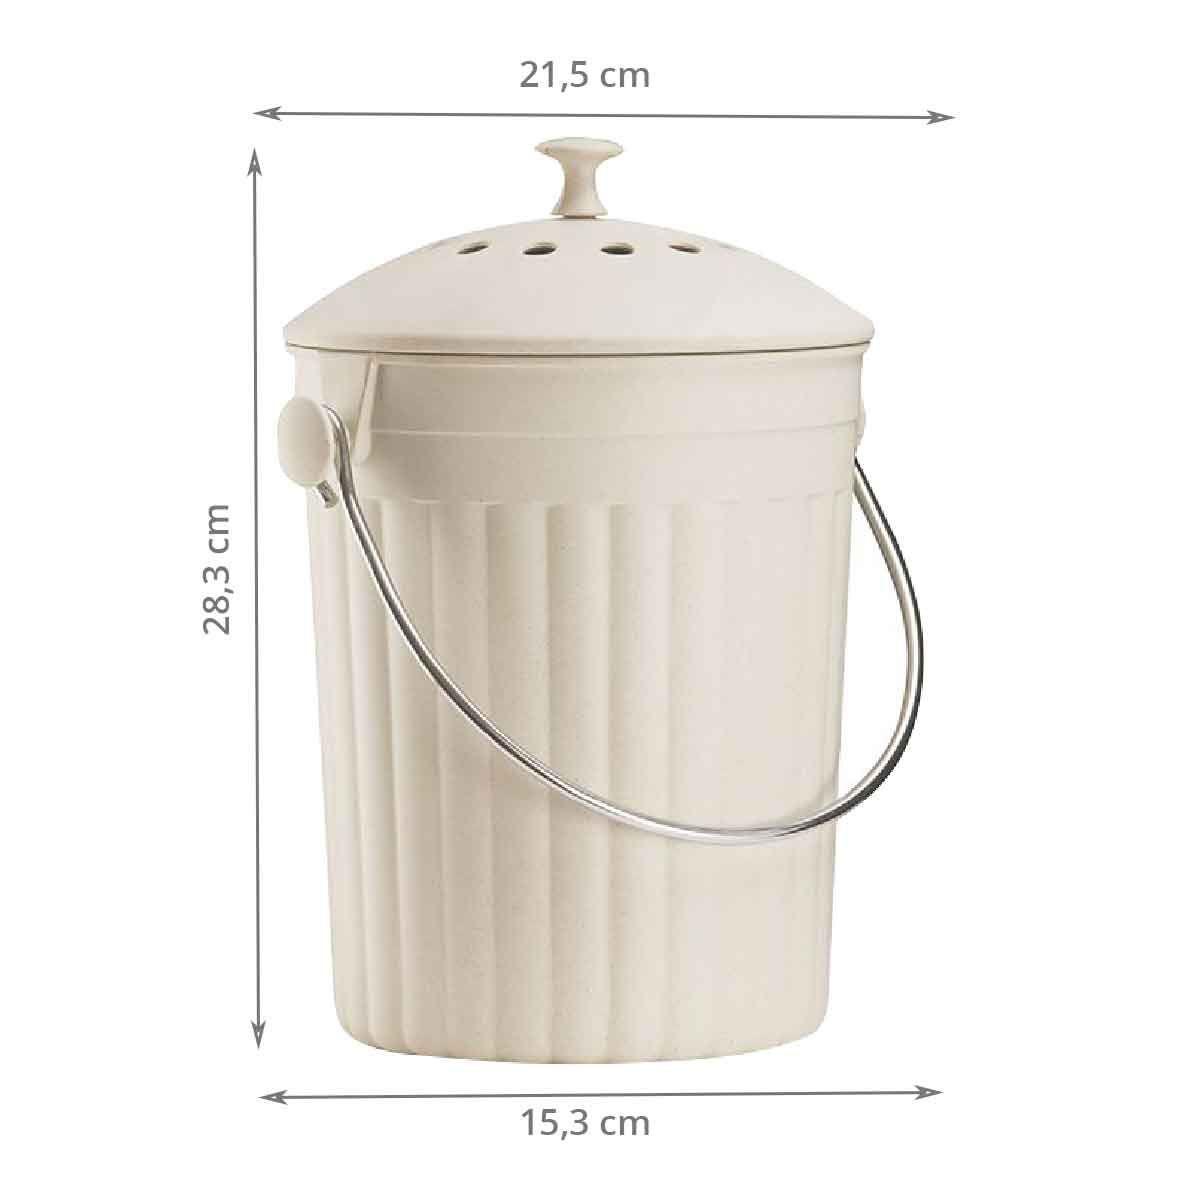 seau compost cologique 4 5 litres. Black Bedroom Furniture Sets. Home Design Ideas